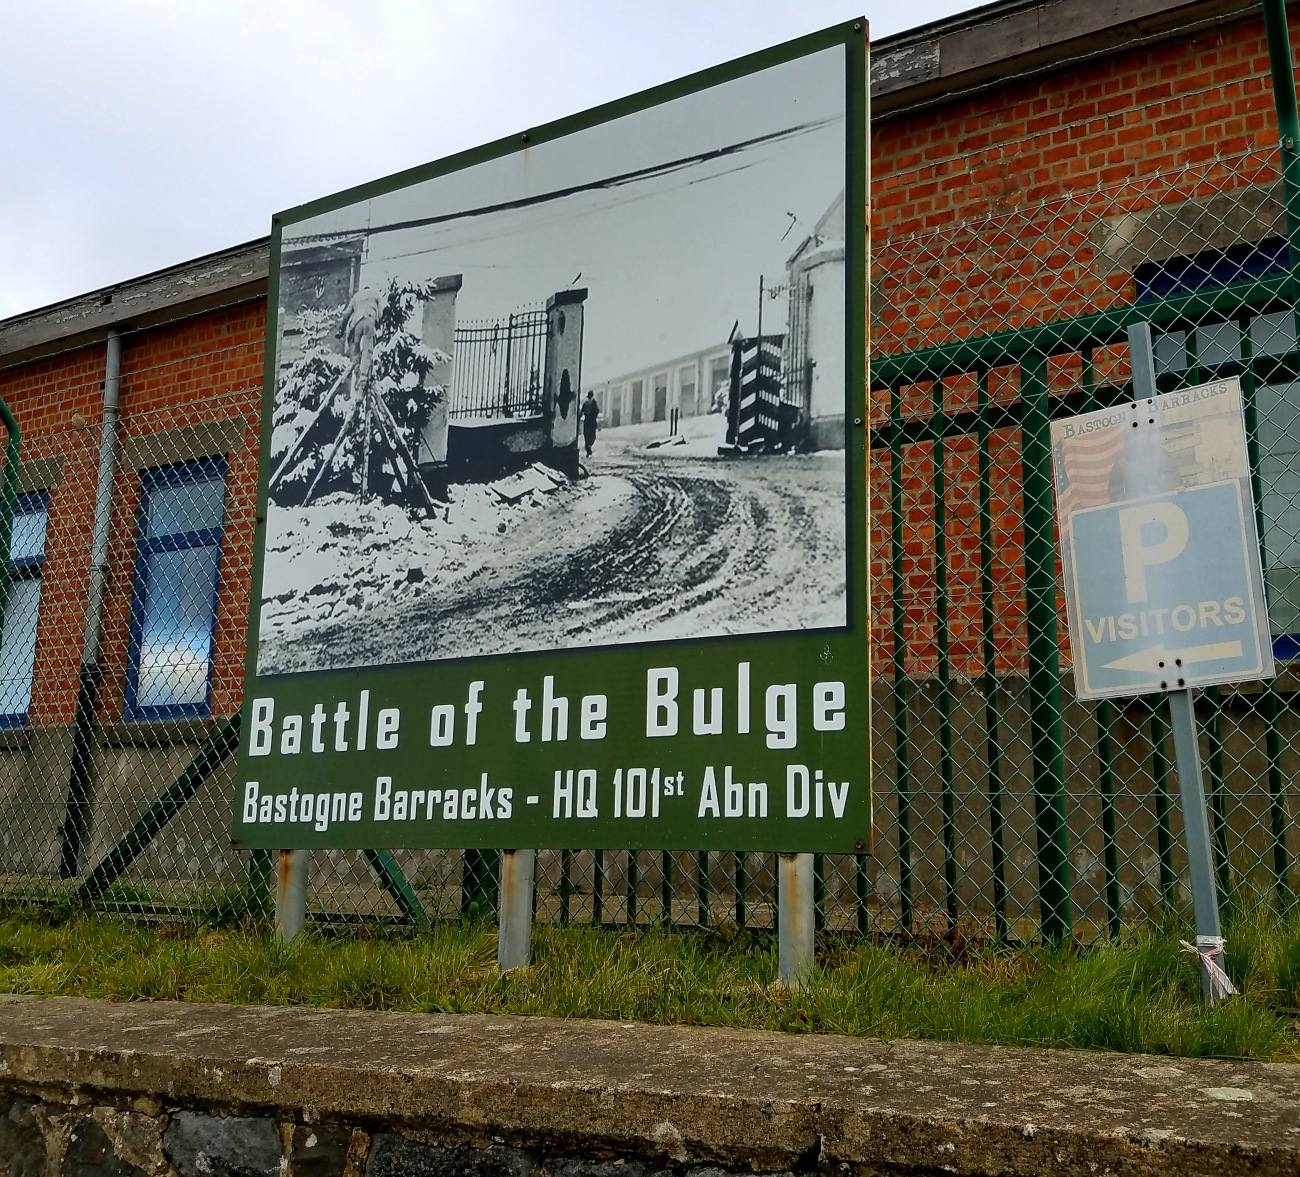 Battle of the Bulge Bastogne Barracks